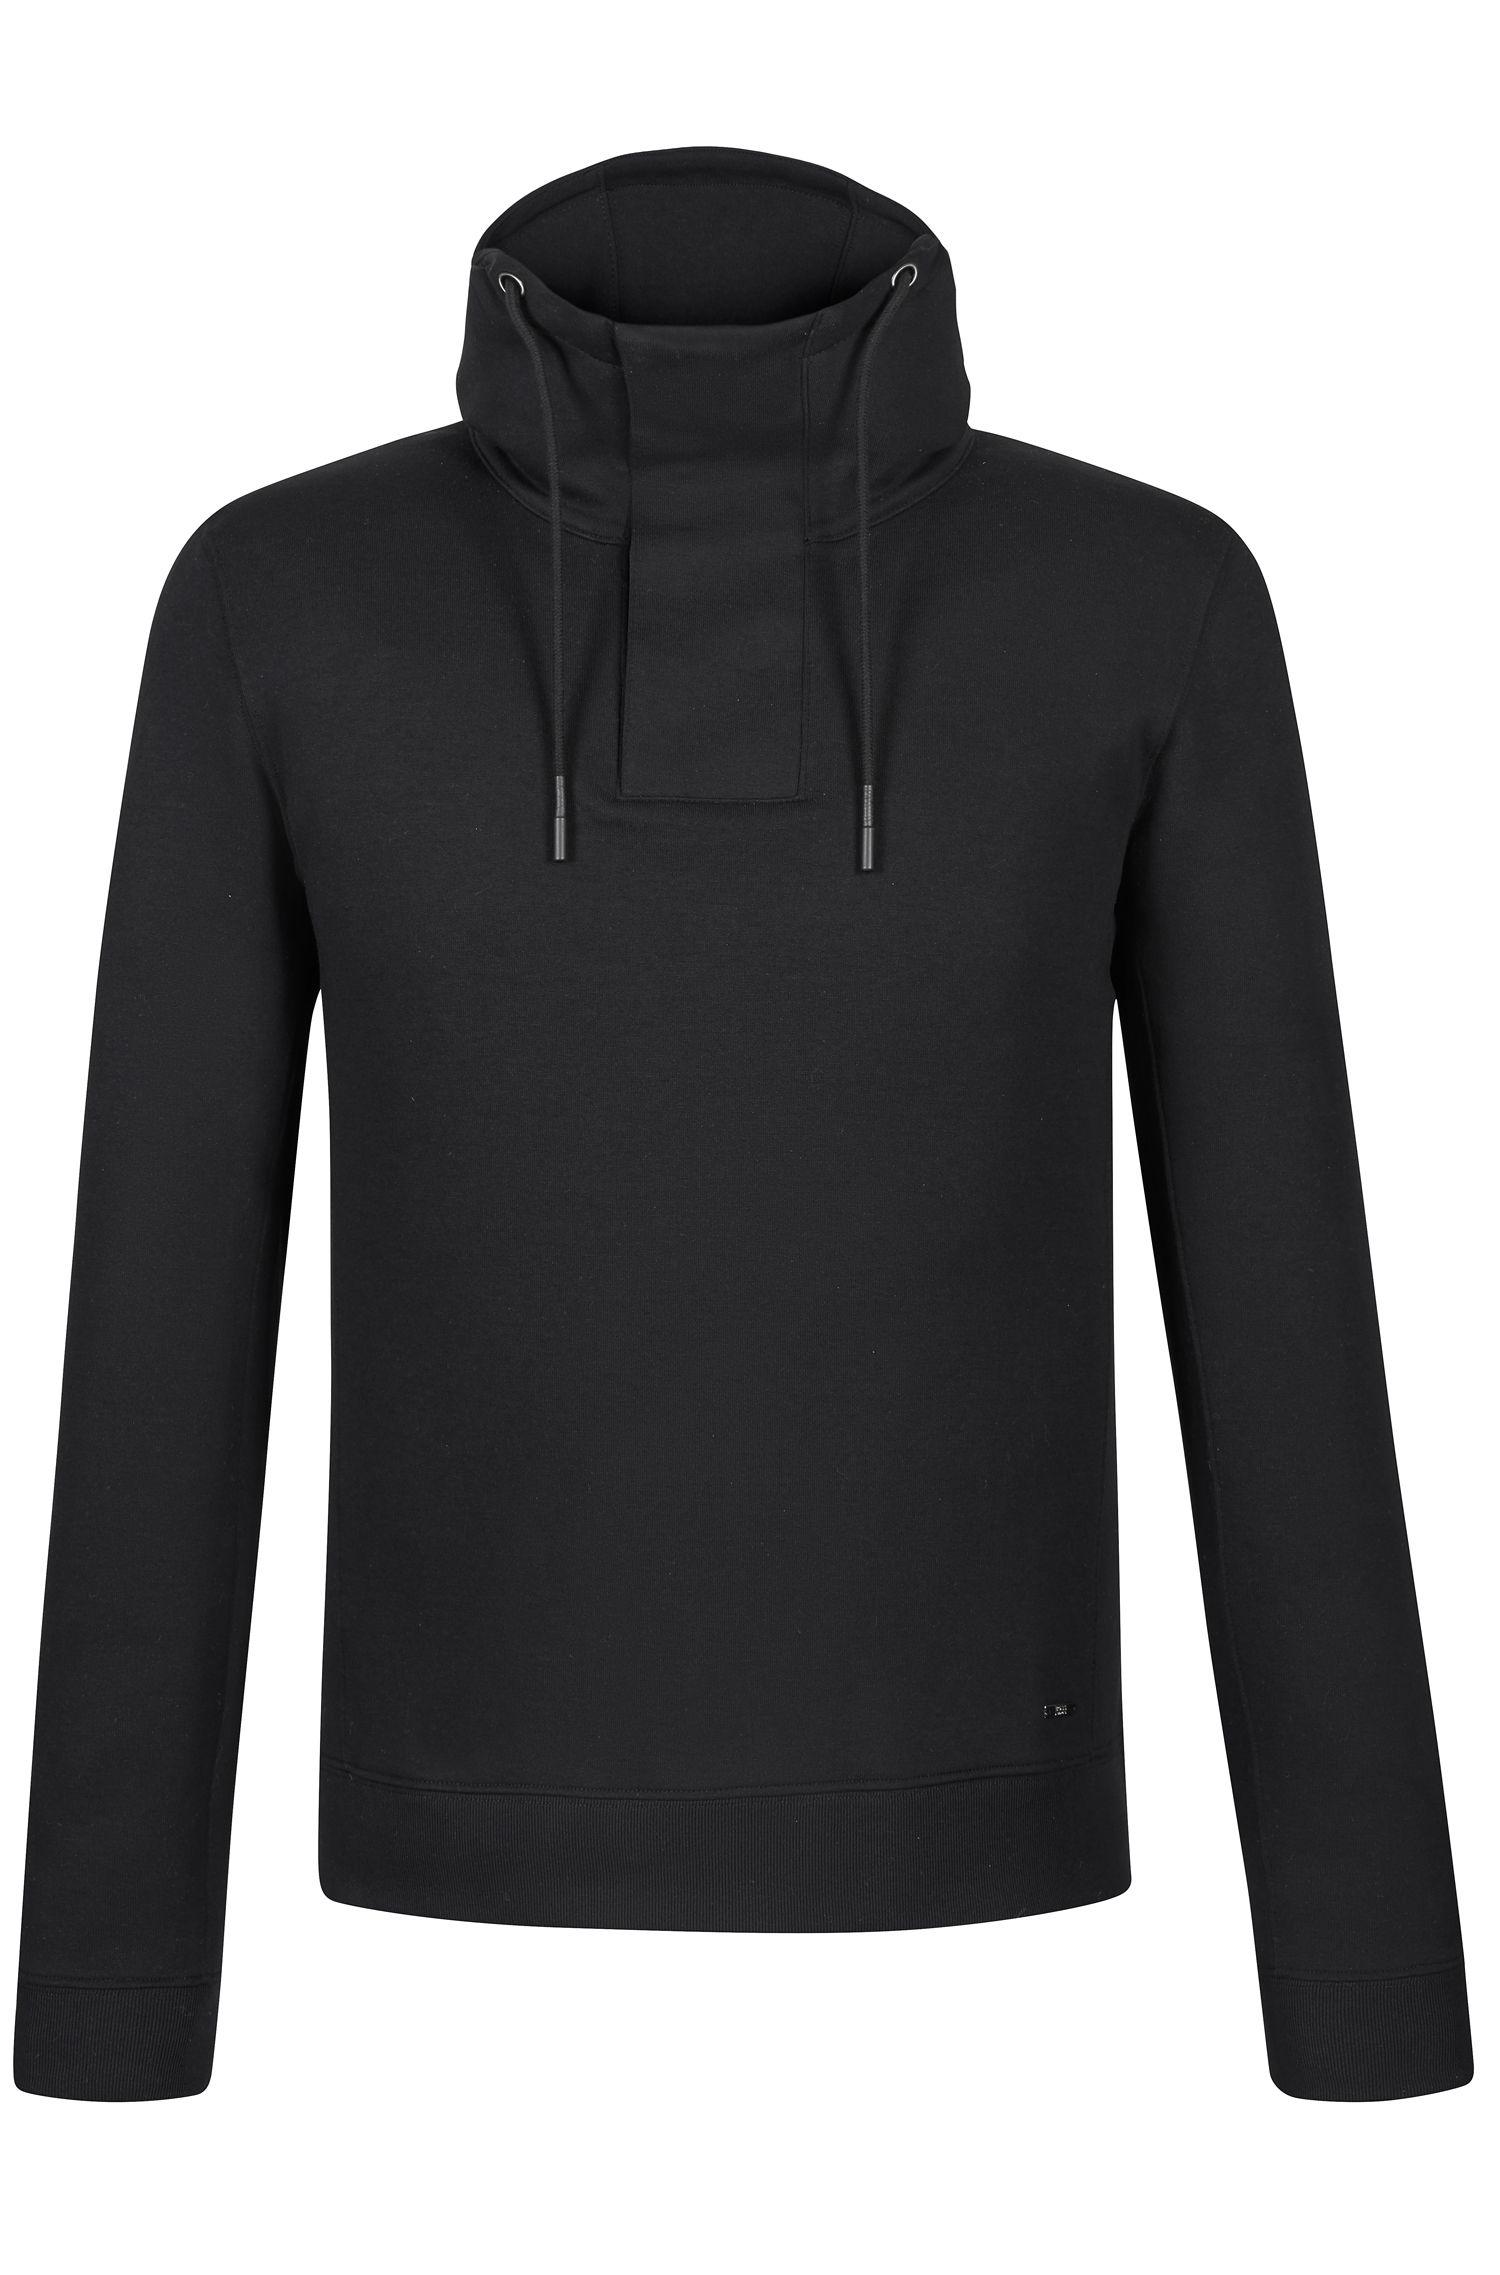 'Seeger' | Cotton Blend Hooded Sweatshirt